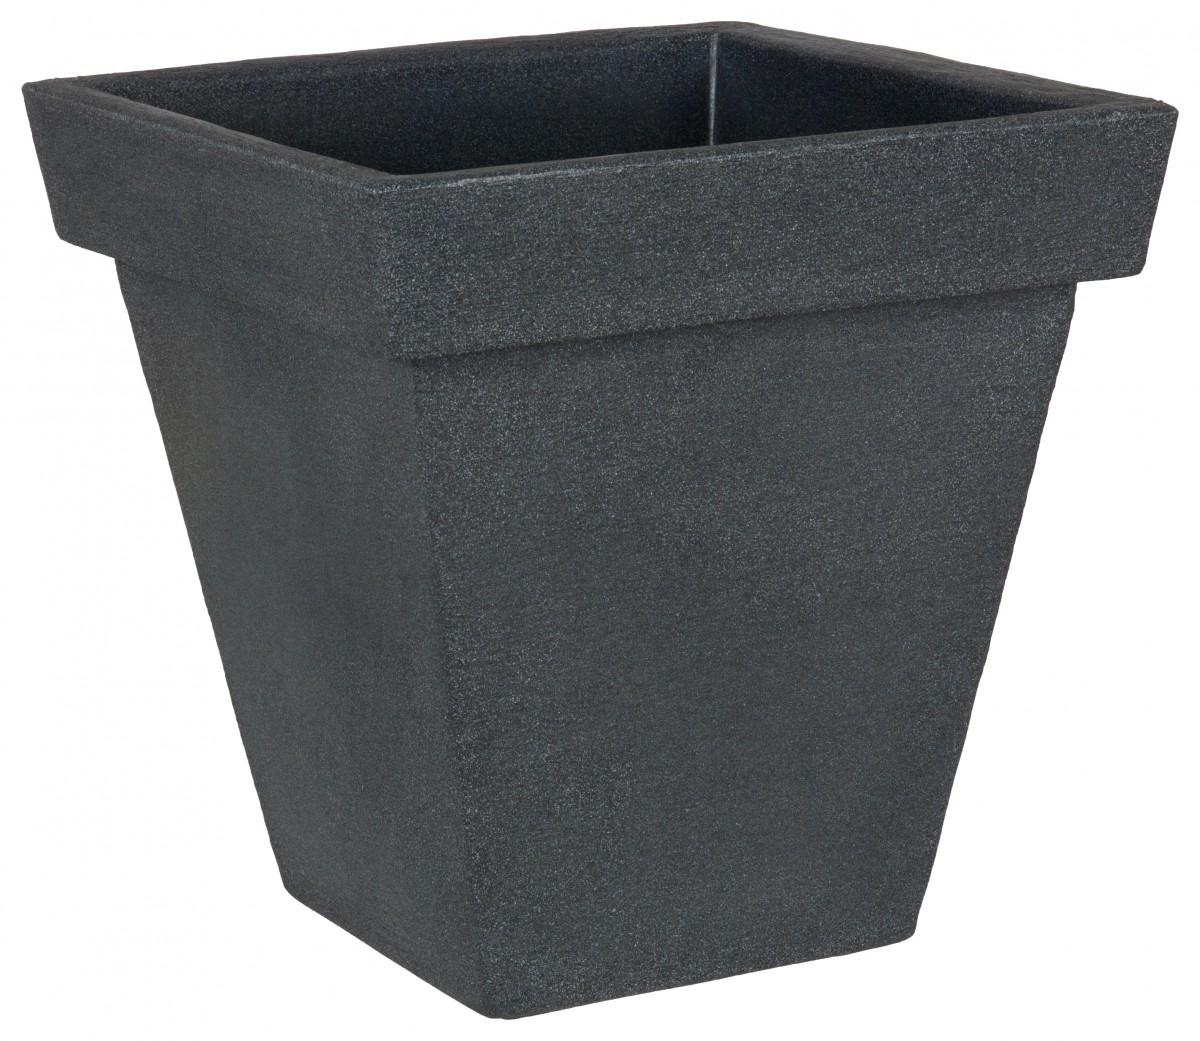 pflanzk bel prado quadratisch aus kunststoff in anthrazit. Black Bedroom Furniture Sets. Home Design Ideas